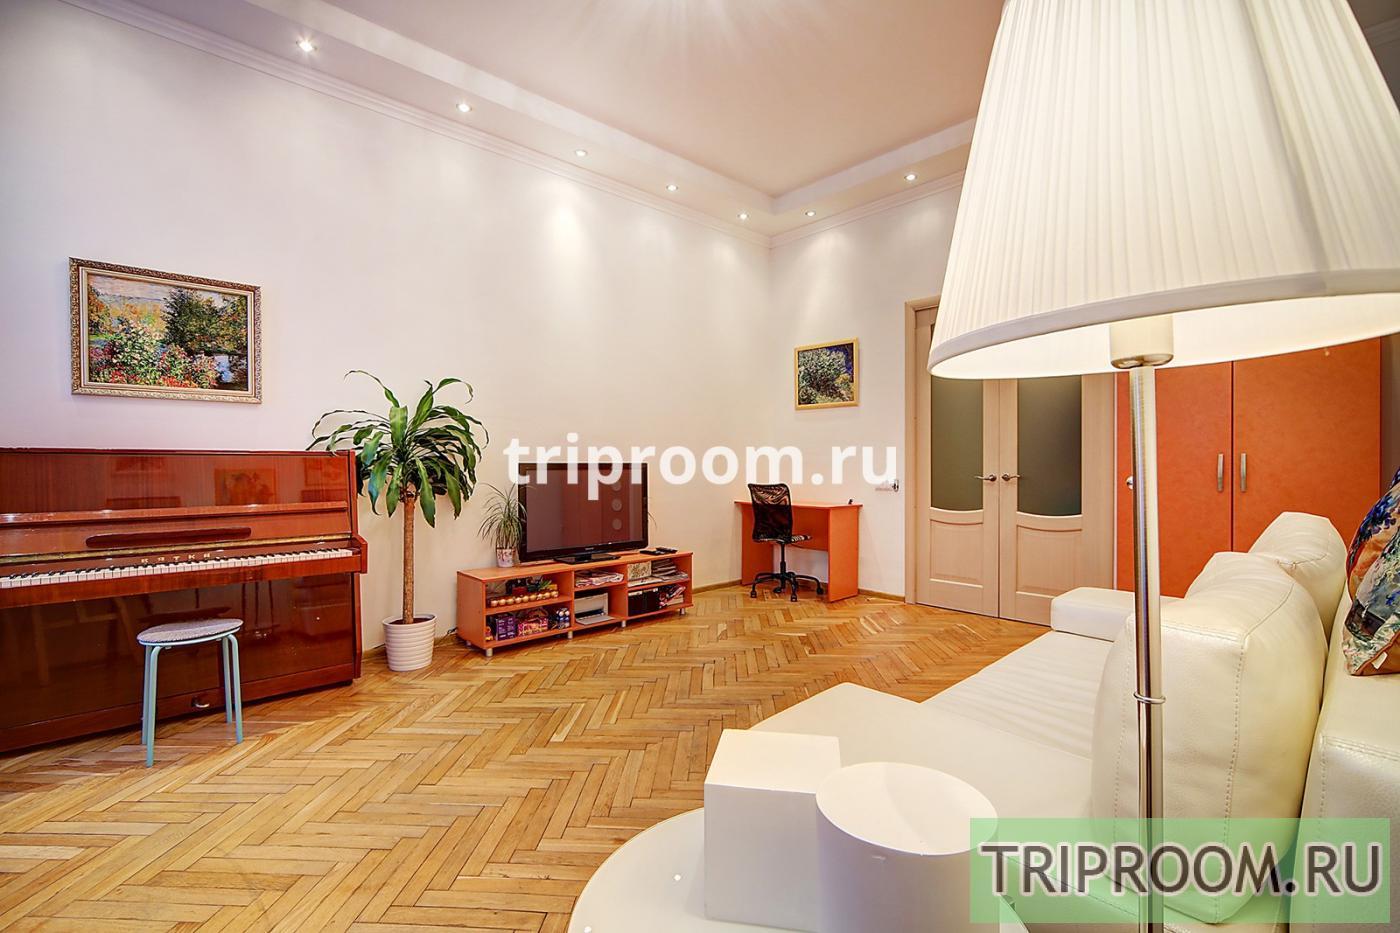 2-комнатная квартира посуточно (вариант № 15426), ул. Лиговский проспект, фото № 9